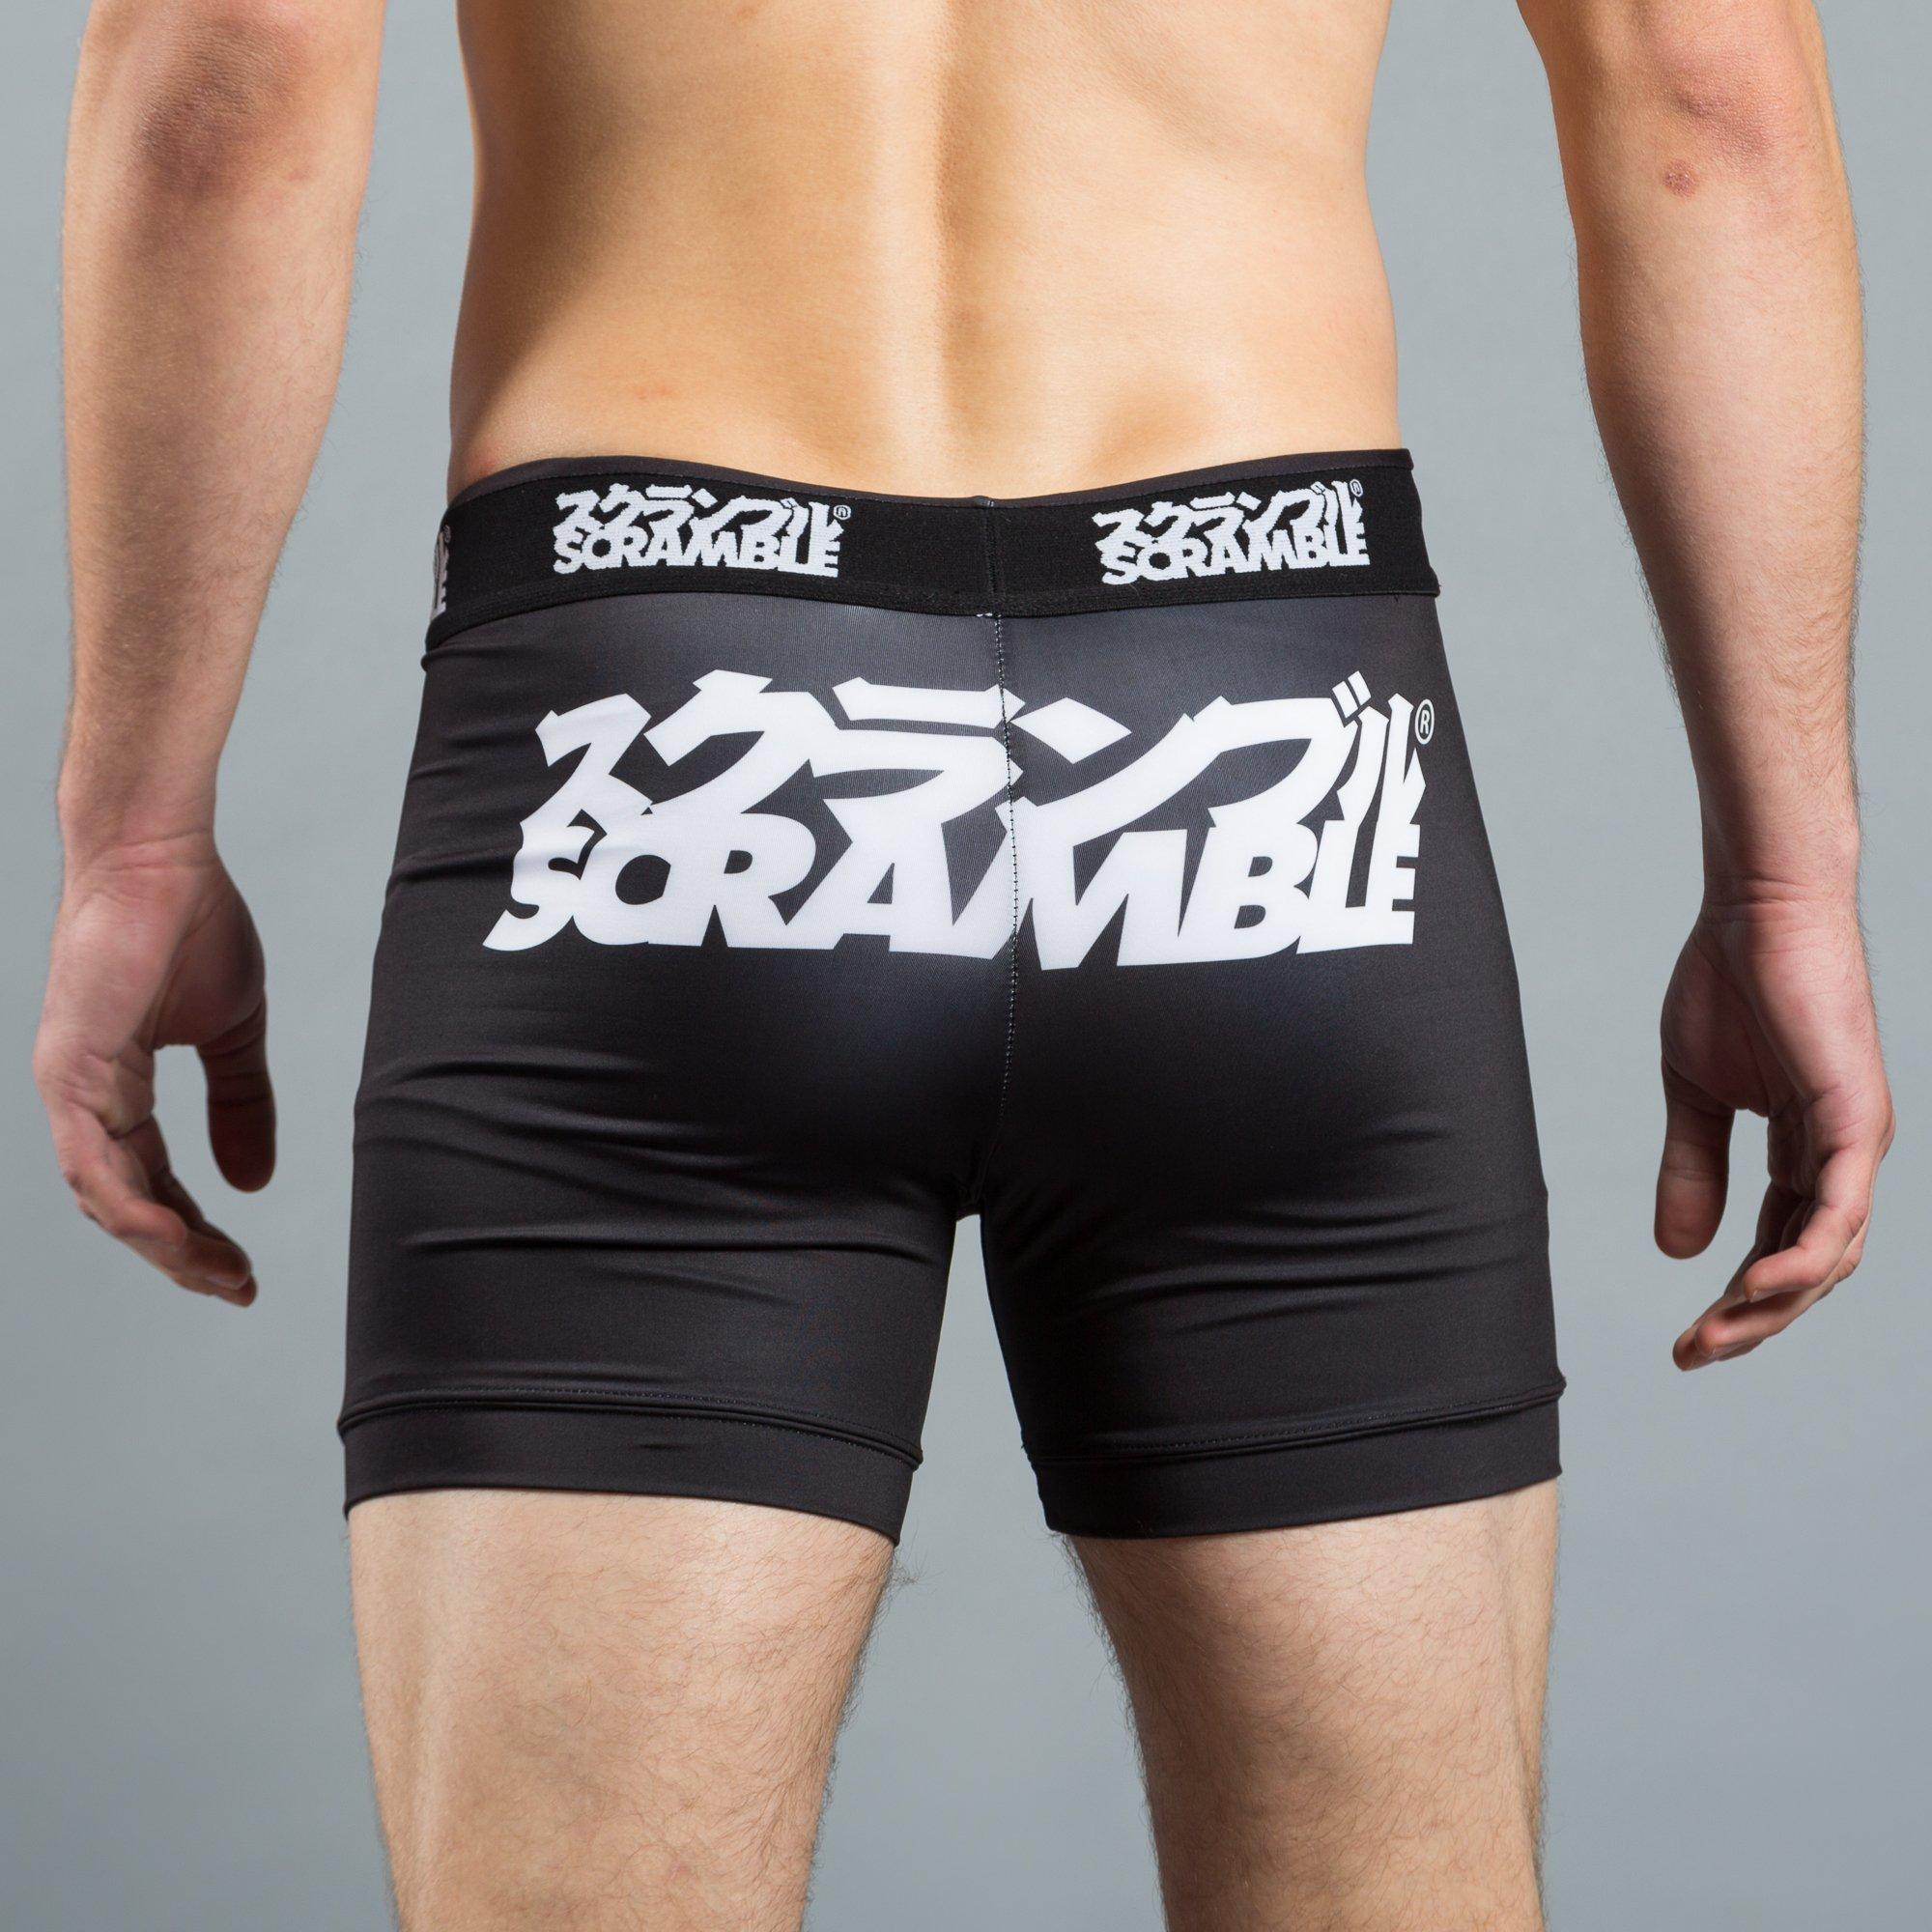 hot-selling professional best price hot-selling authentic Scramble Roundel Vale Tudo Shorts Black